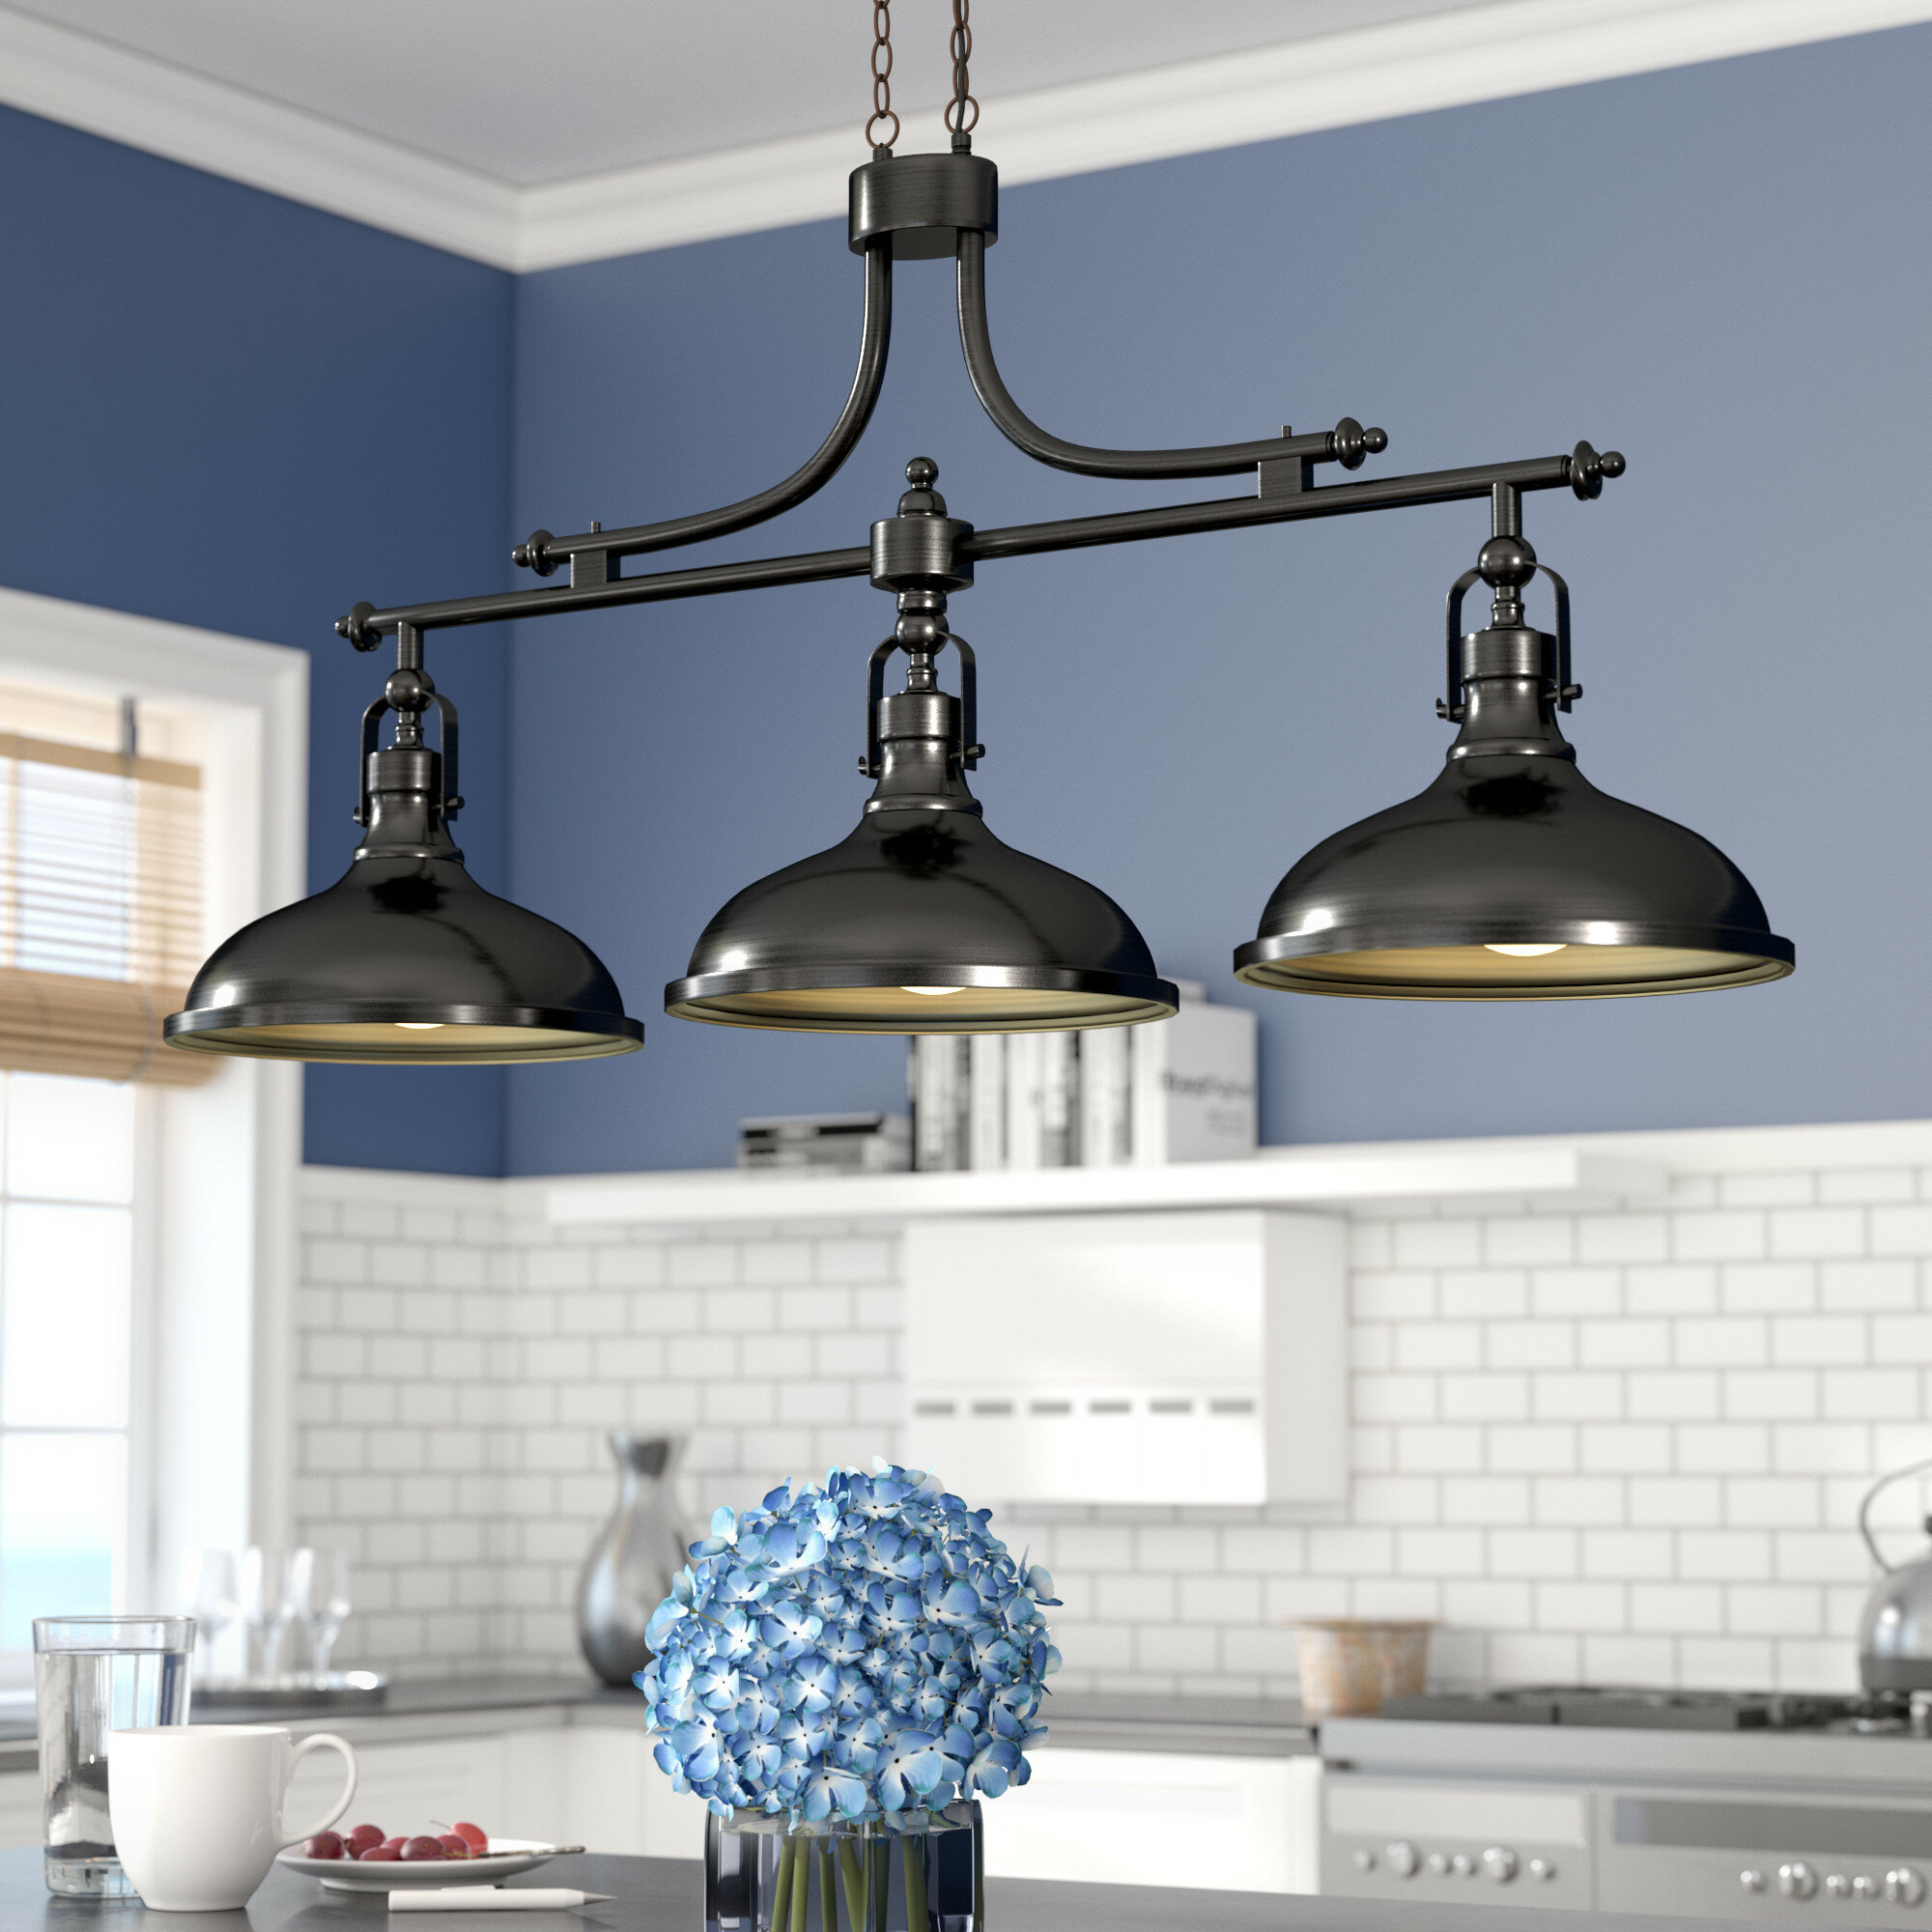 Marvelous Oversized Greater Than 30 Wide Pendant Lighting Sale Up Interior Design Ideas Oxytryabchikinfo